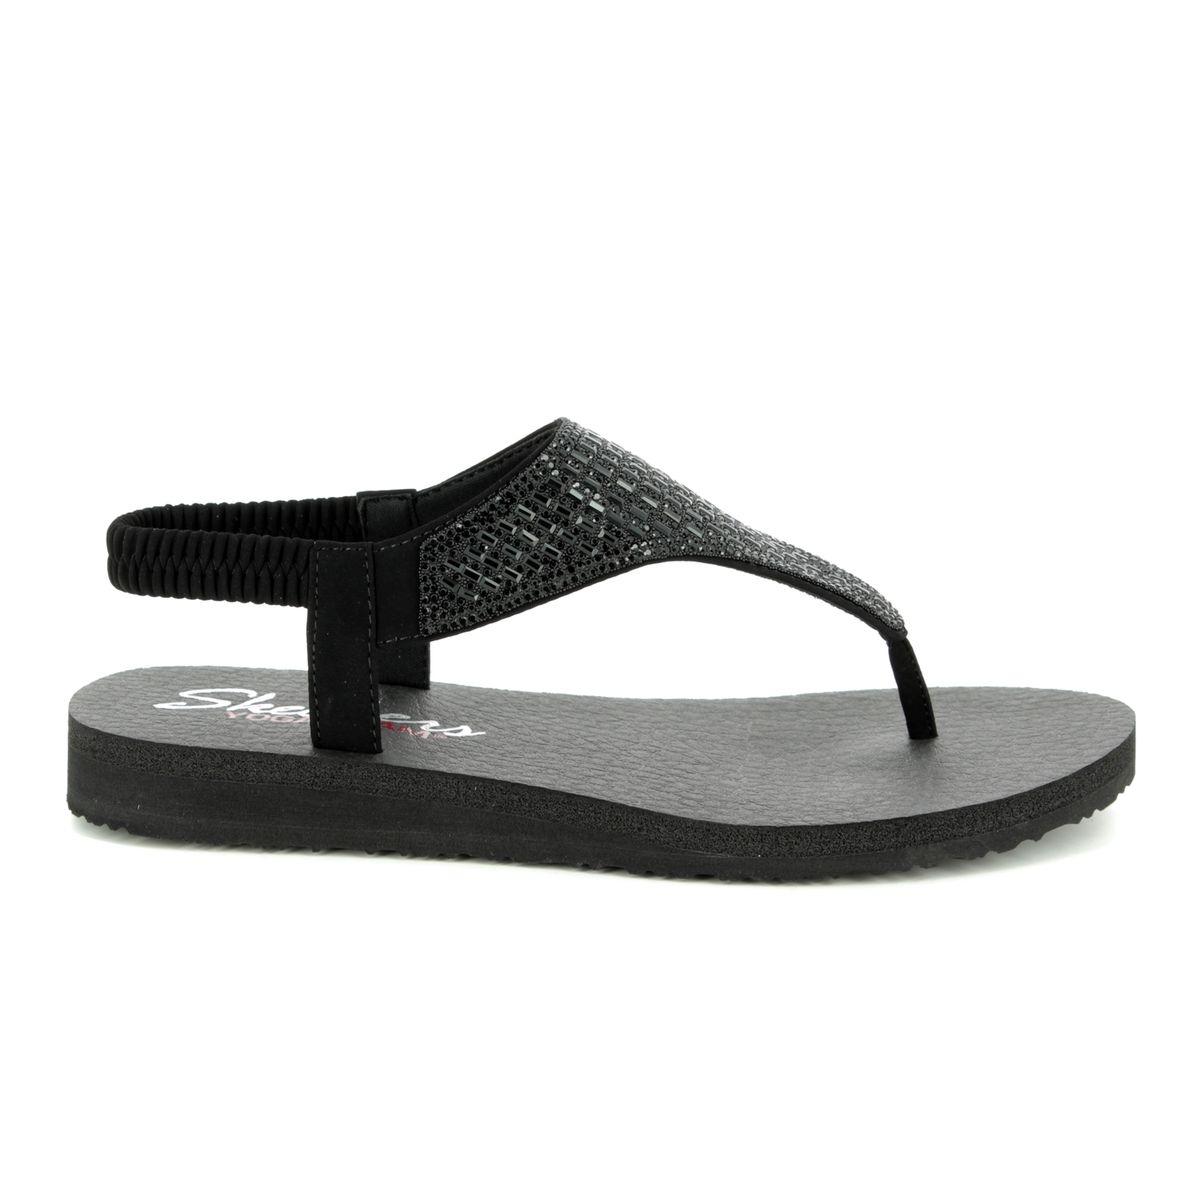 27f030c0 Skechers Flat Sandals - Black - 31560 MEDITATION ROCK CROWN